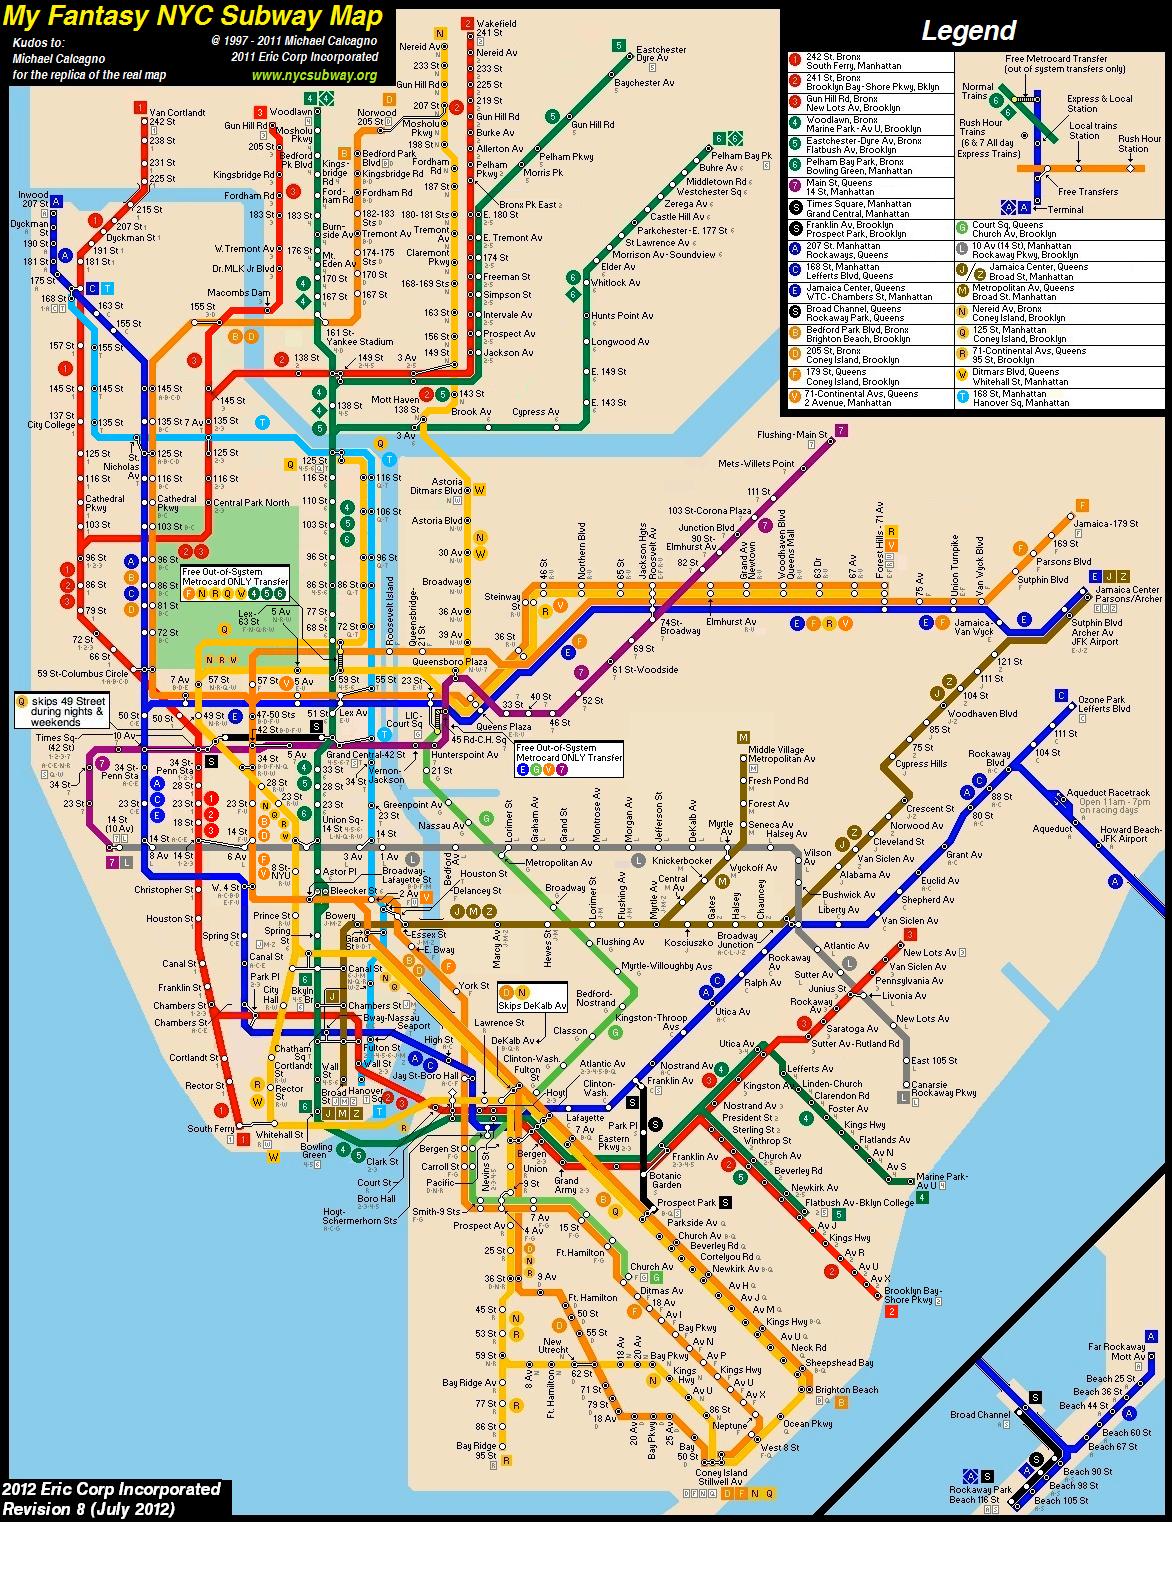 Nyc Subway Map B D Line.Fantasy Nyc Subway Map Revision 8 By Ecinc2xxx On Deviantart